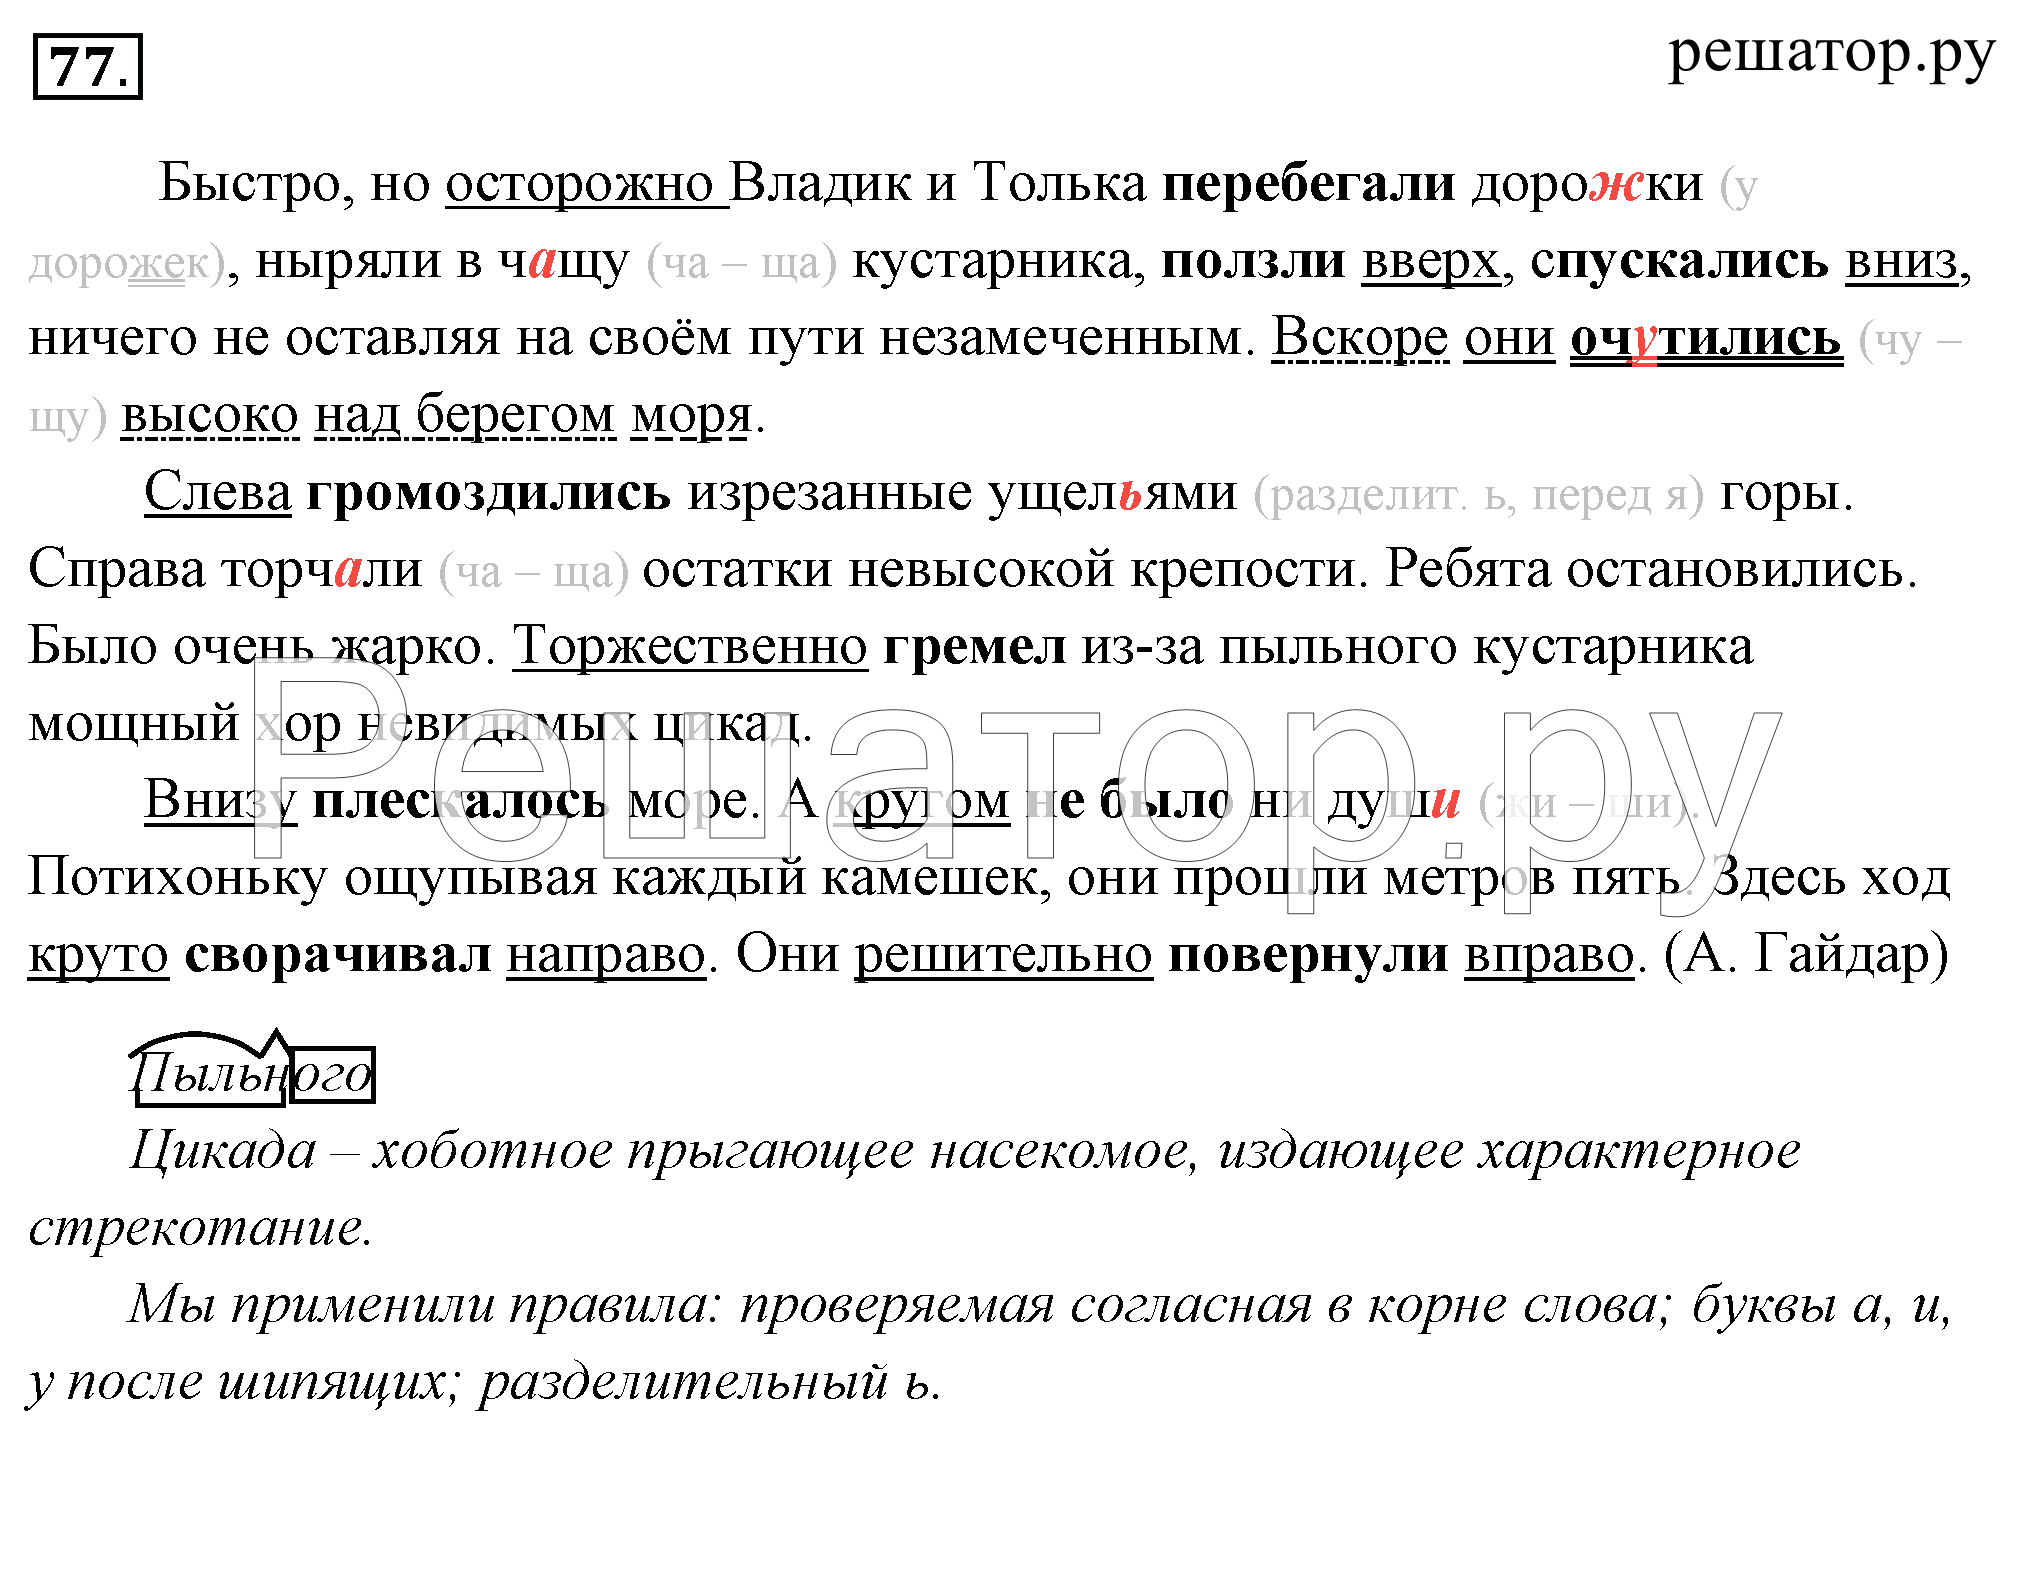 Гдз ладыженская 5 класс 2018 1 часть